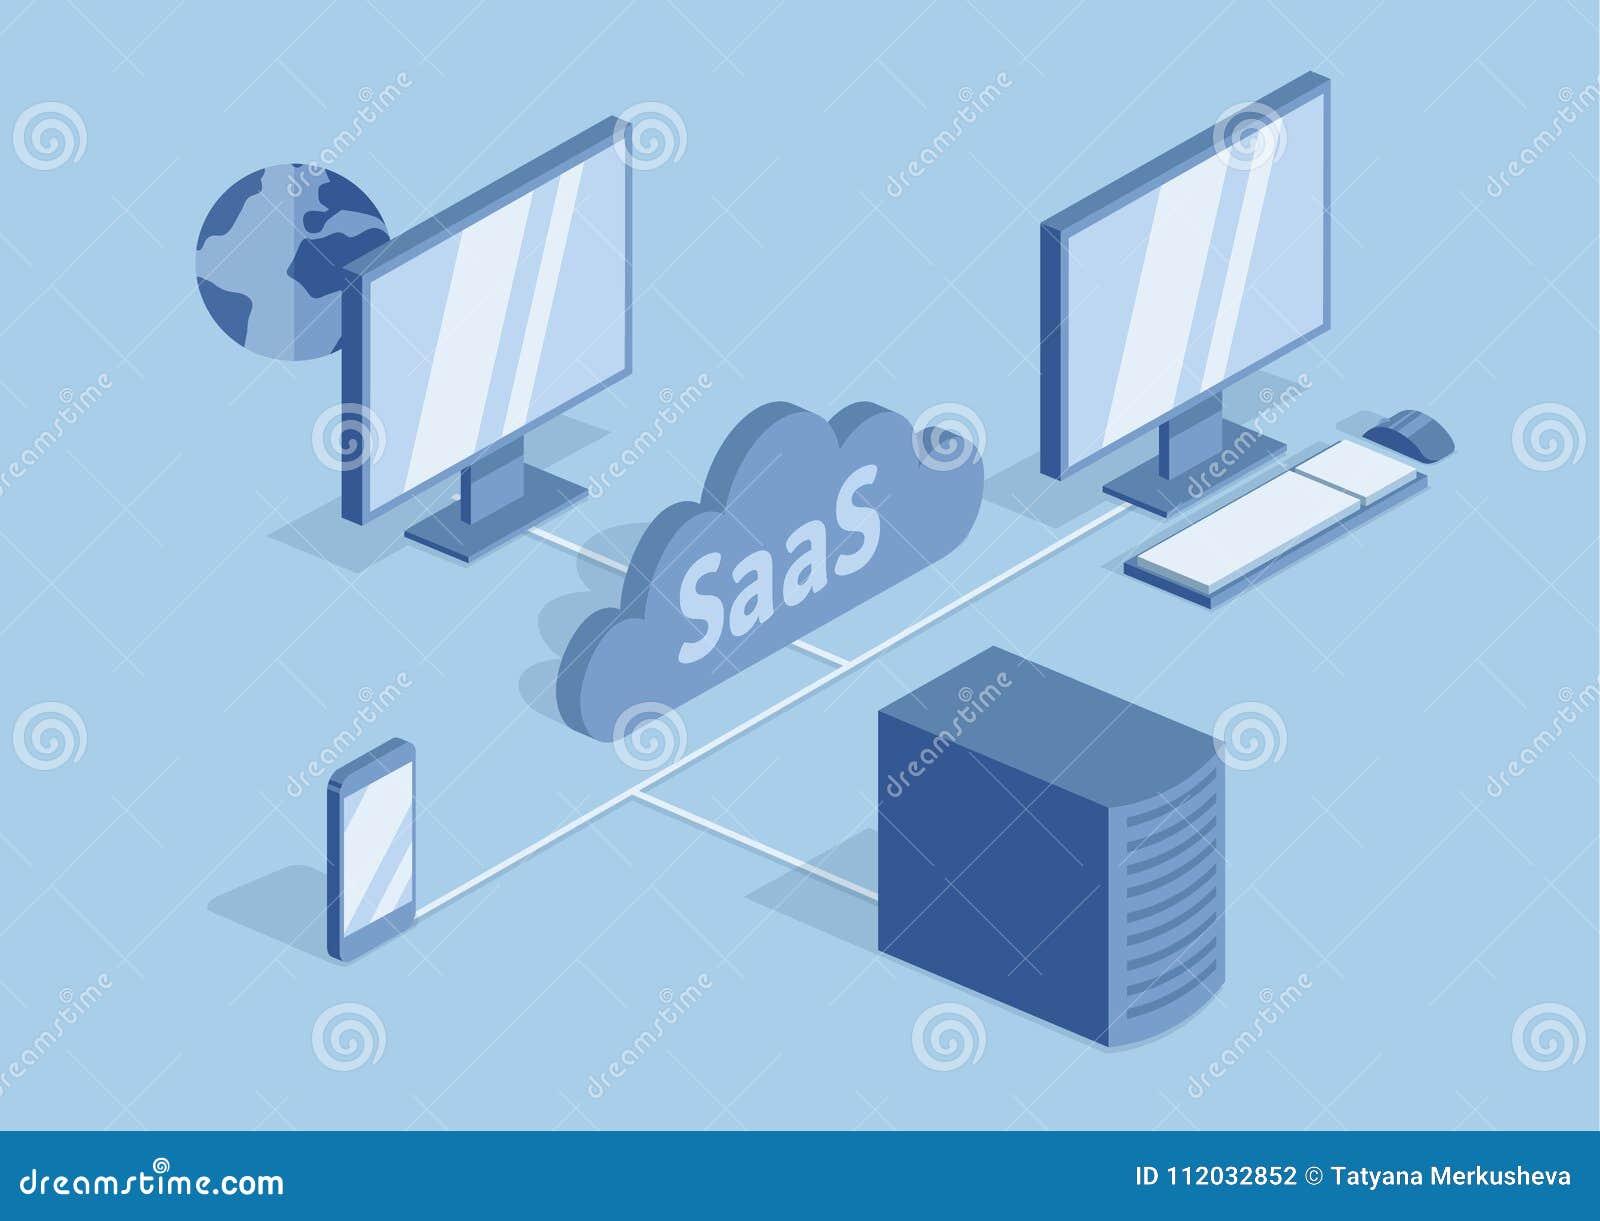 SaaS的概念,软件作为服务 覆盖在计算机、移动设备、代码、app服务器和数据库上的软件